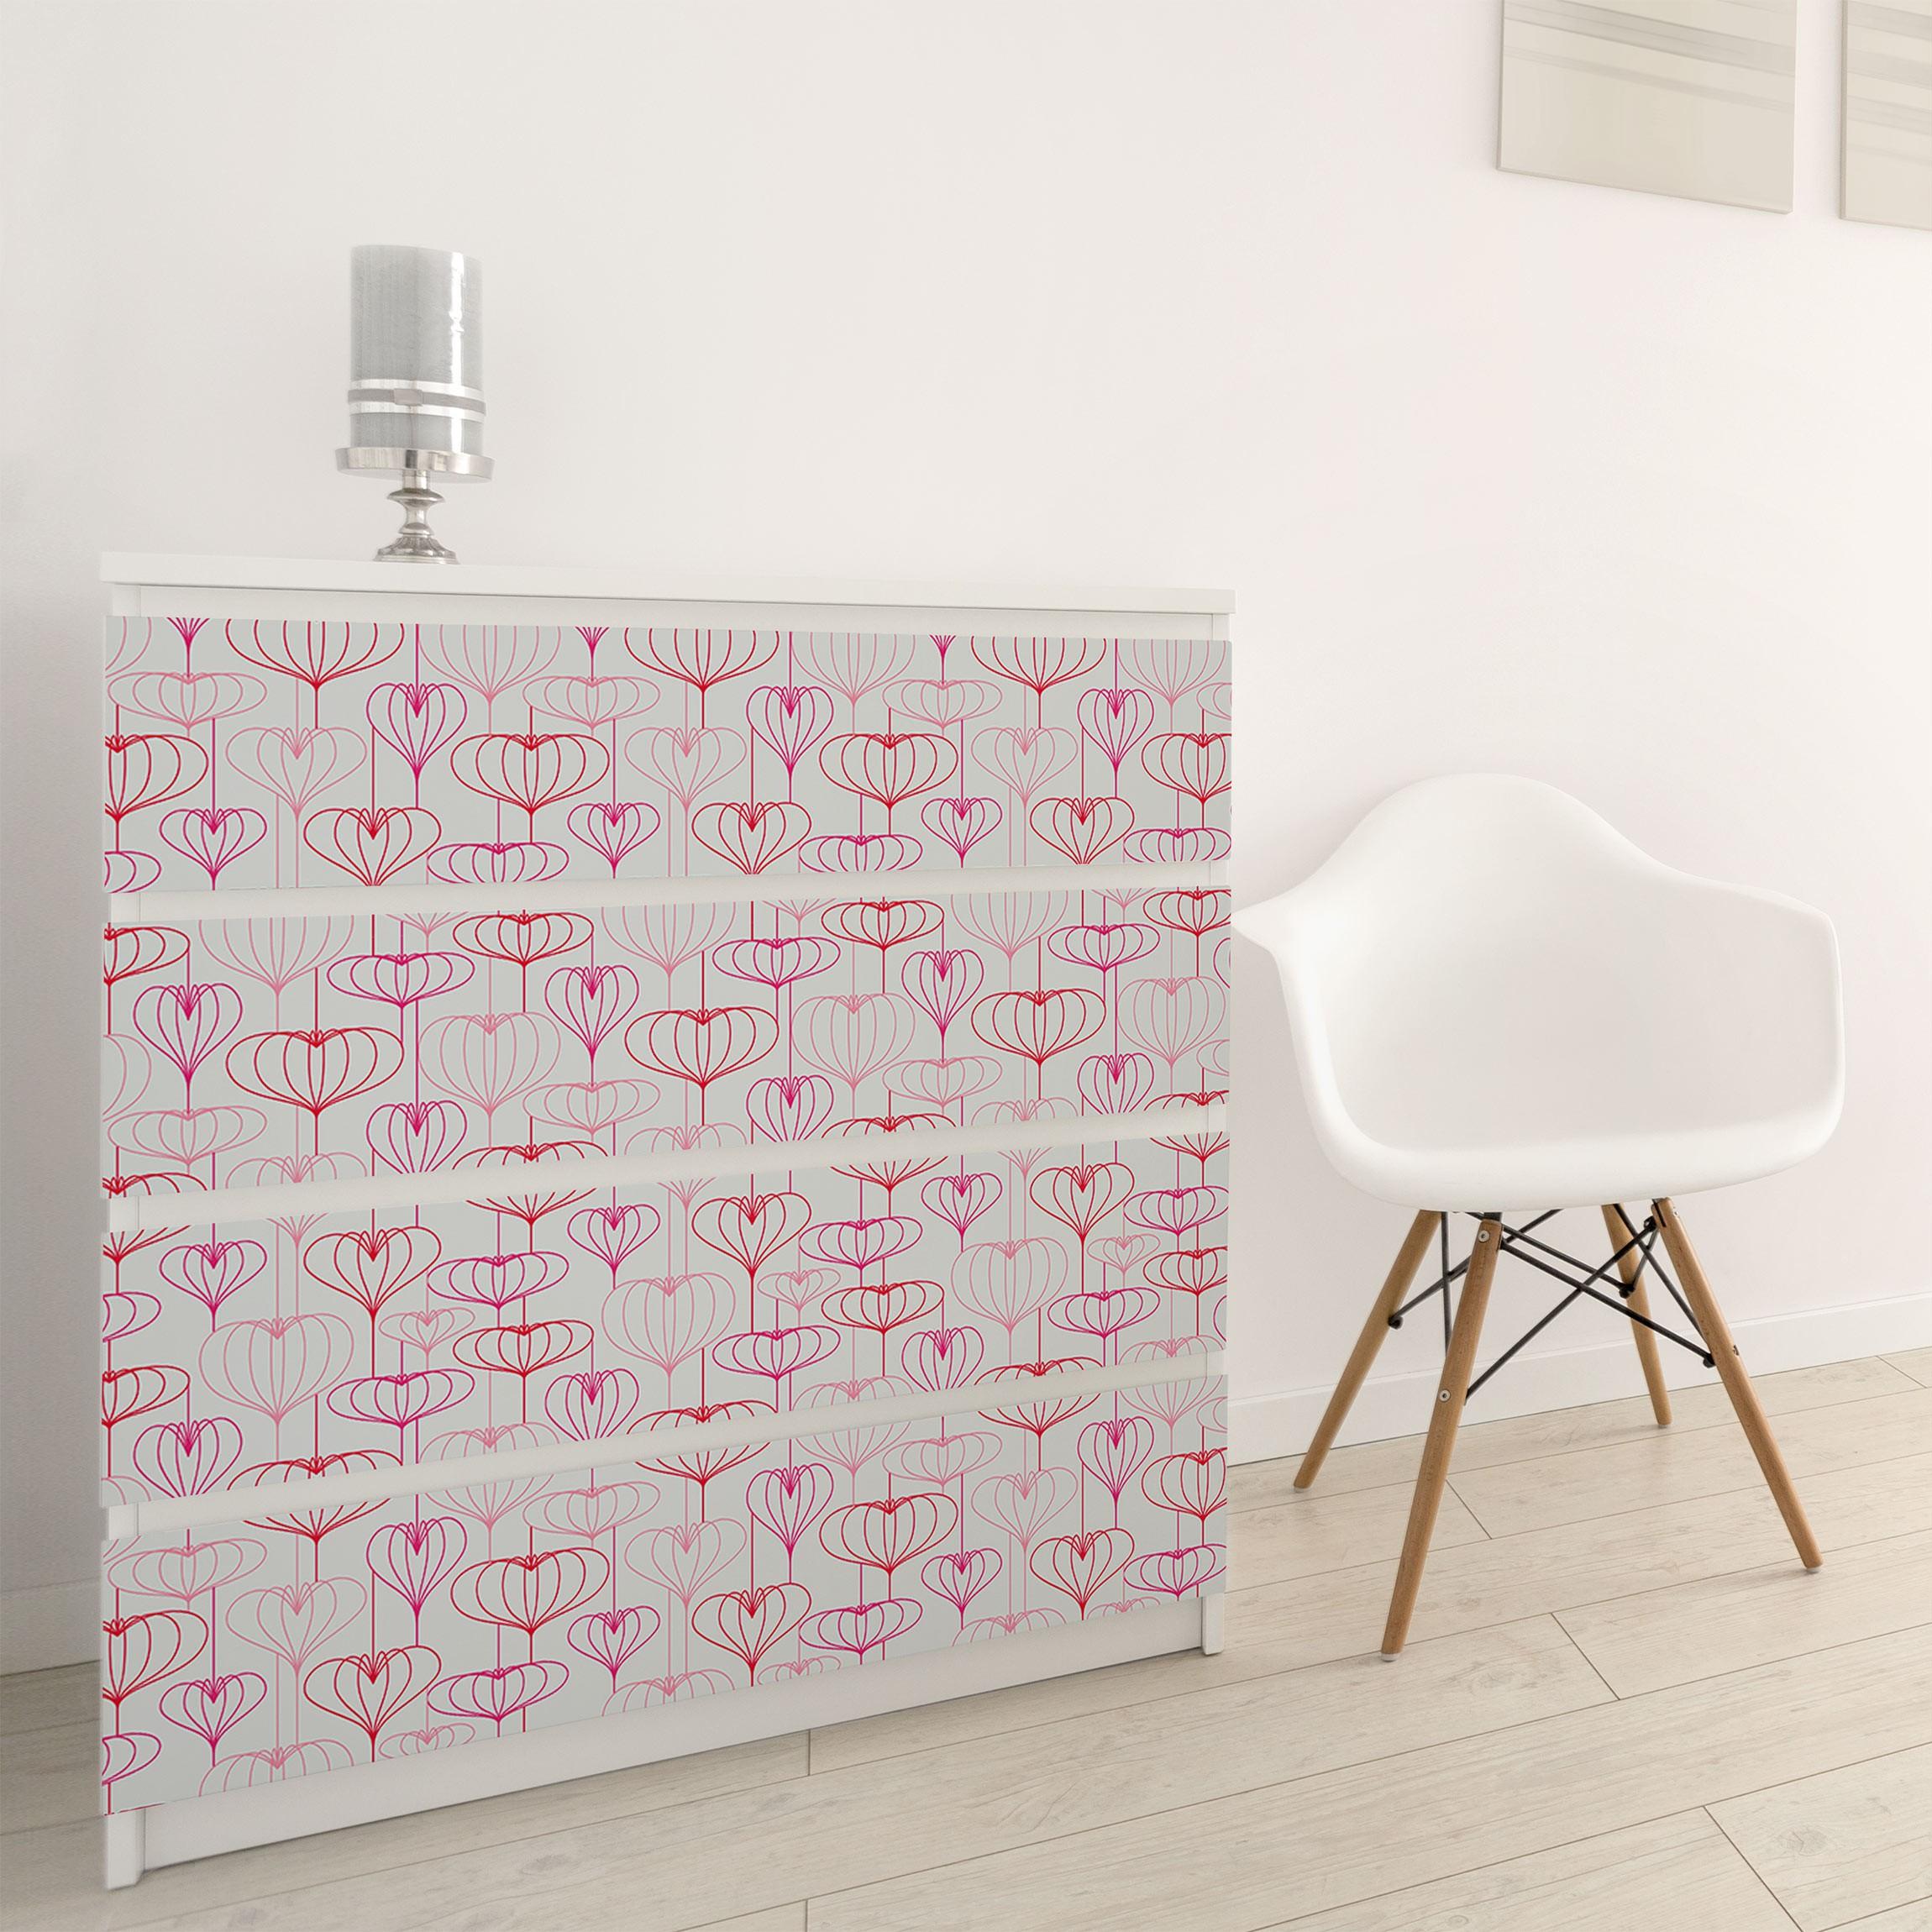 carta adesiva per mobili heart pattern. Black Bedroom Furniture Sets. Home Design Ideas